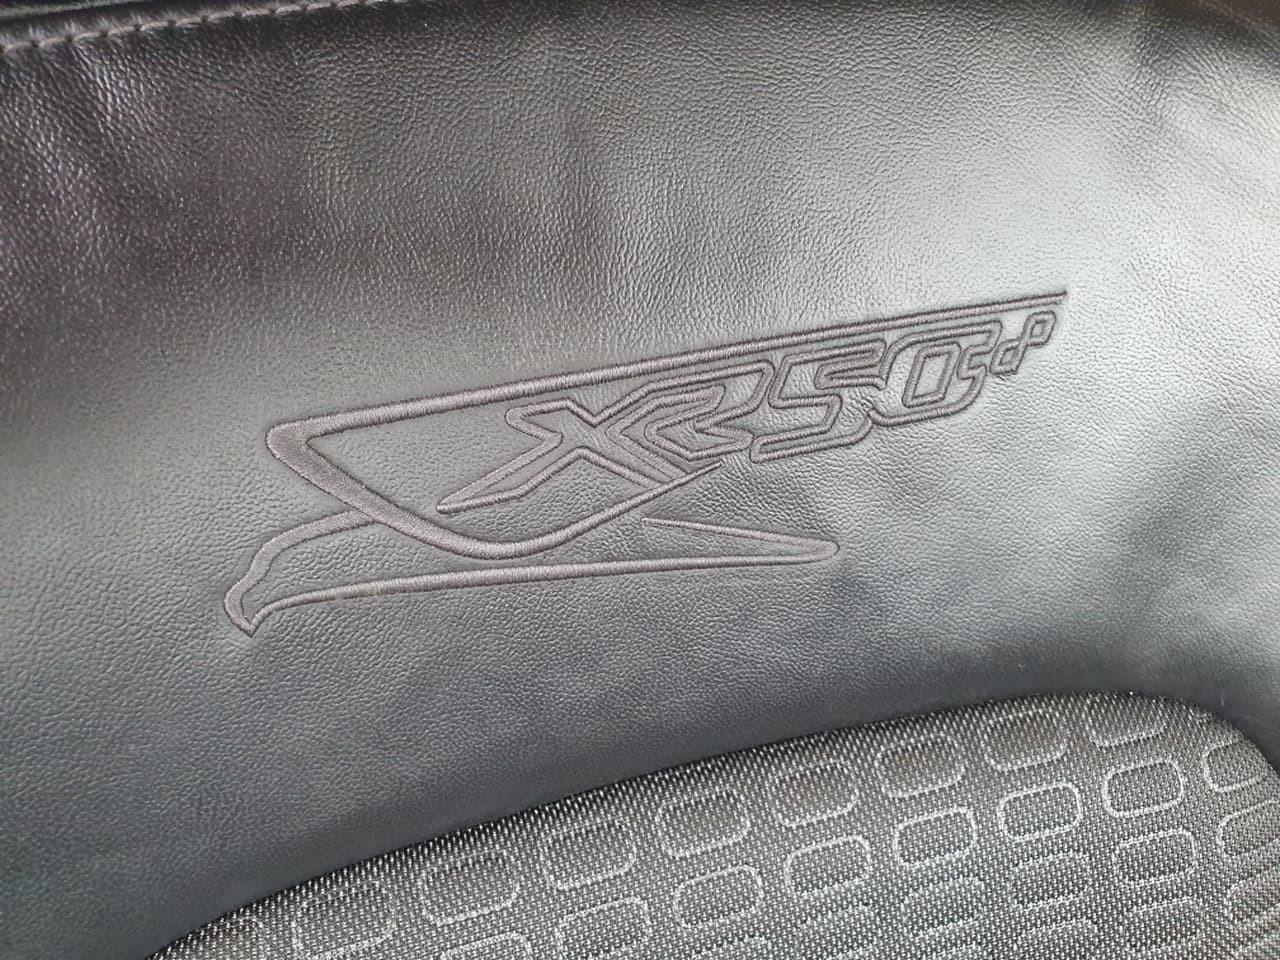 2010 Ford Falcon XR6 for sale in Lavington - Blacklocks Ford